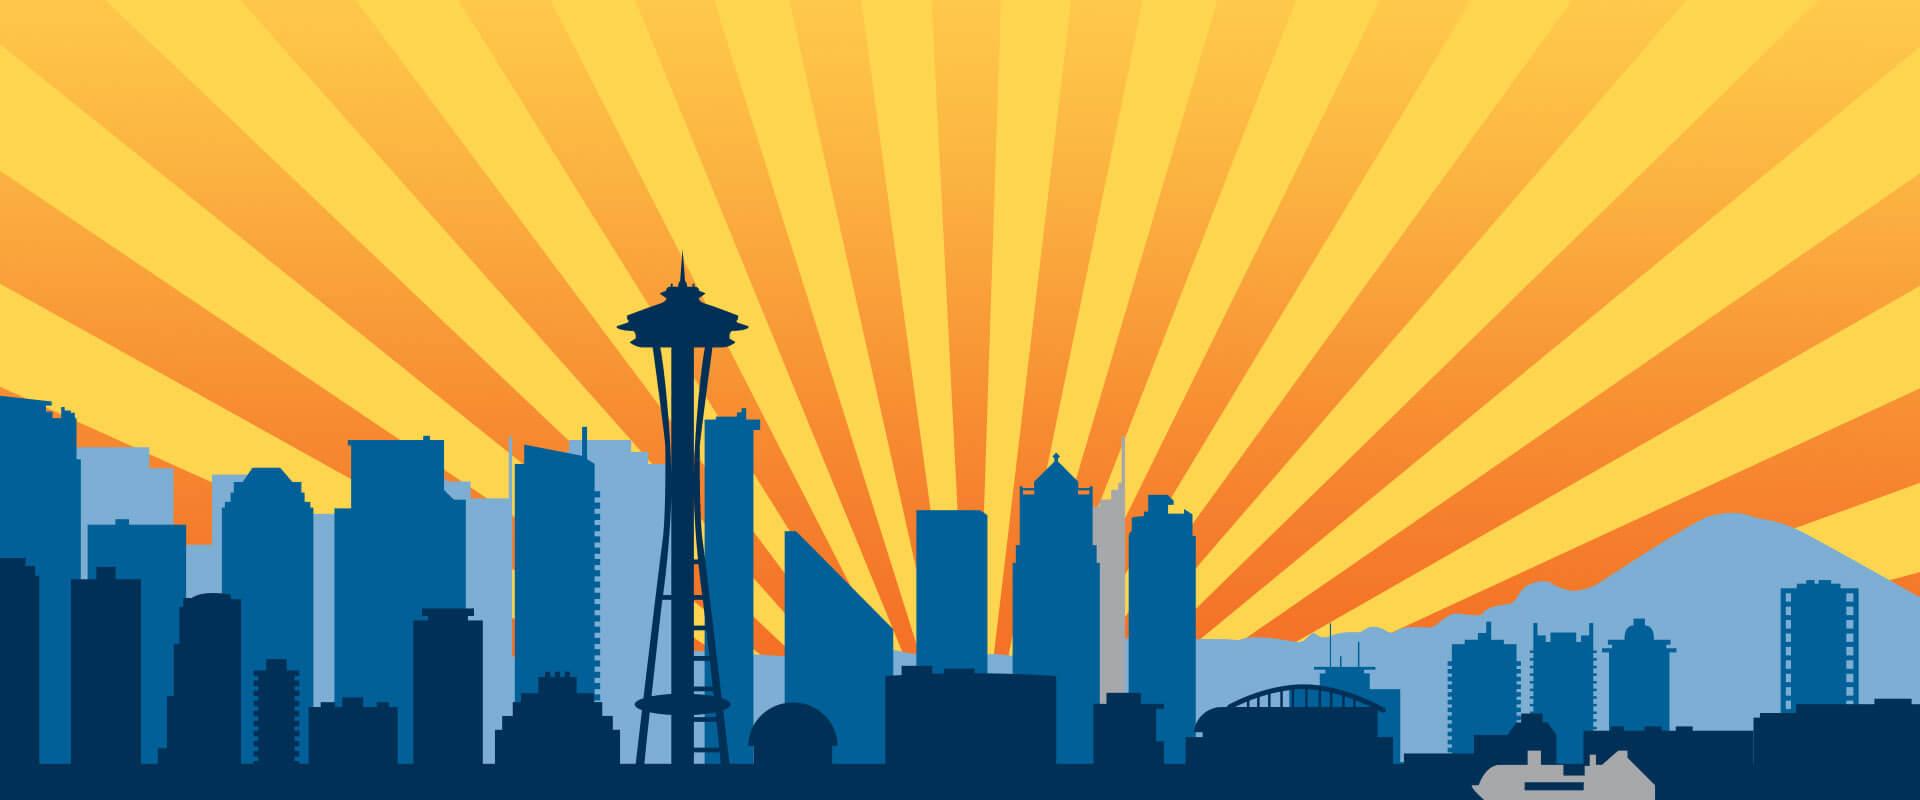 Seattle Housing Market Predictions 2019